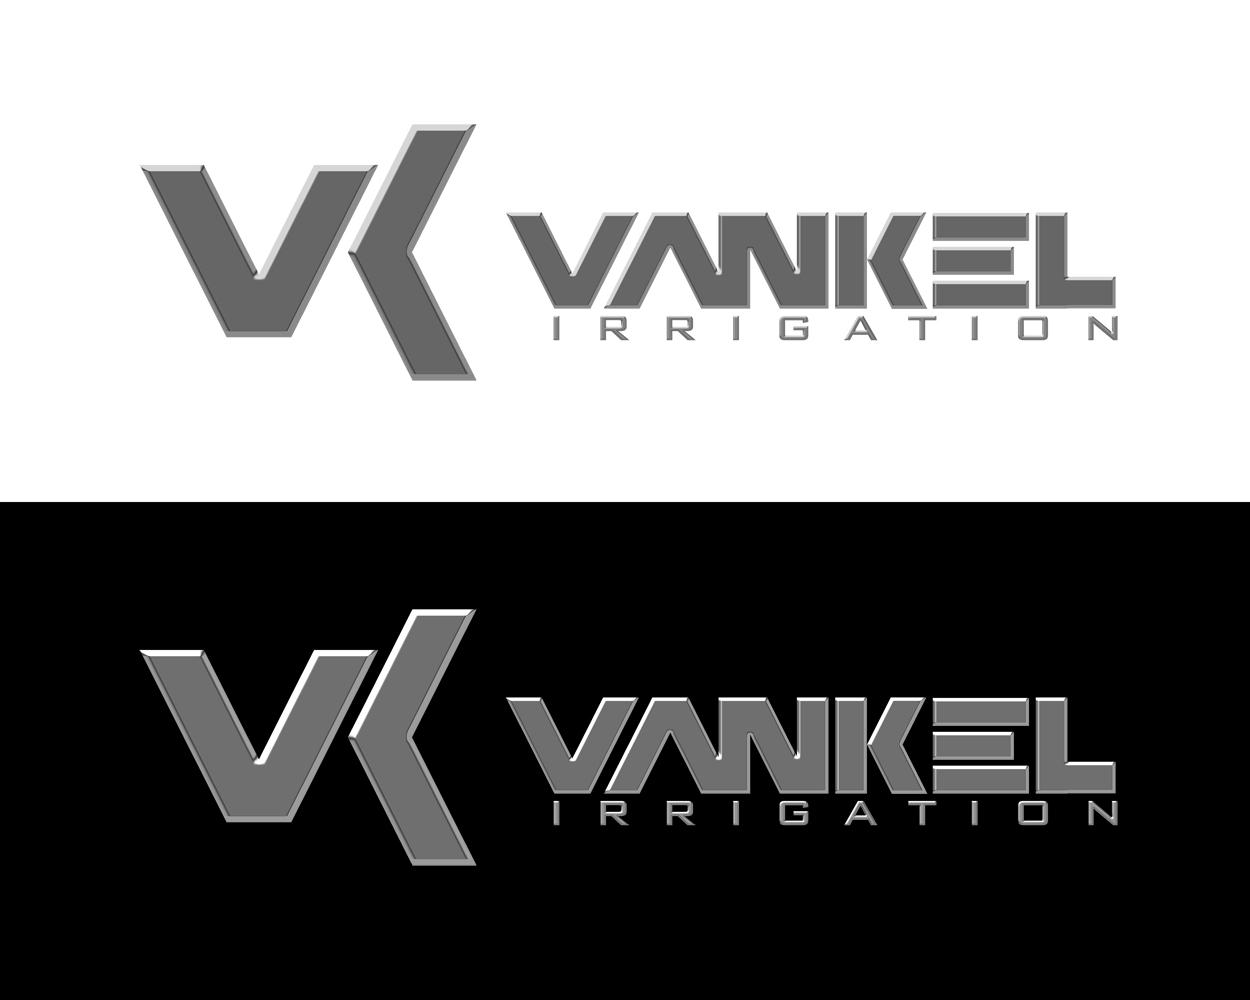 Logo Design by moidgreat - Entry No. 224 in the Logo Design Contest Van-Kel Irrigation Logo Design.